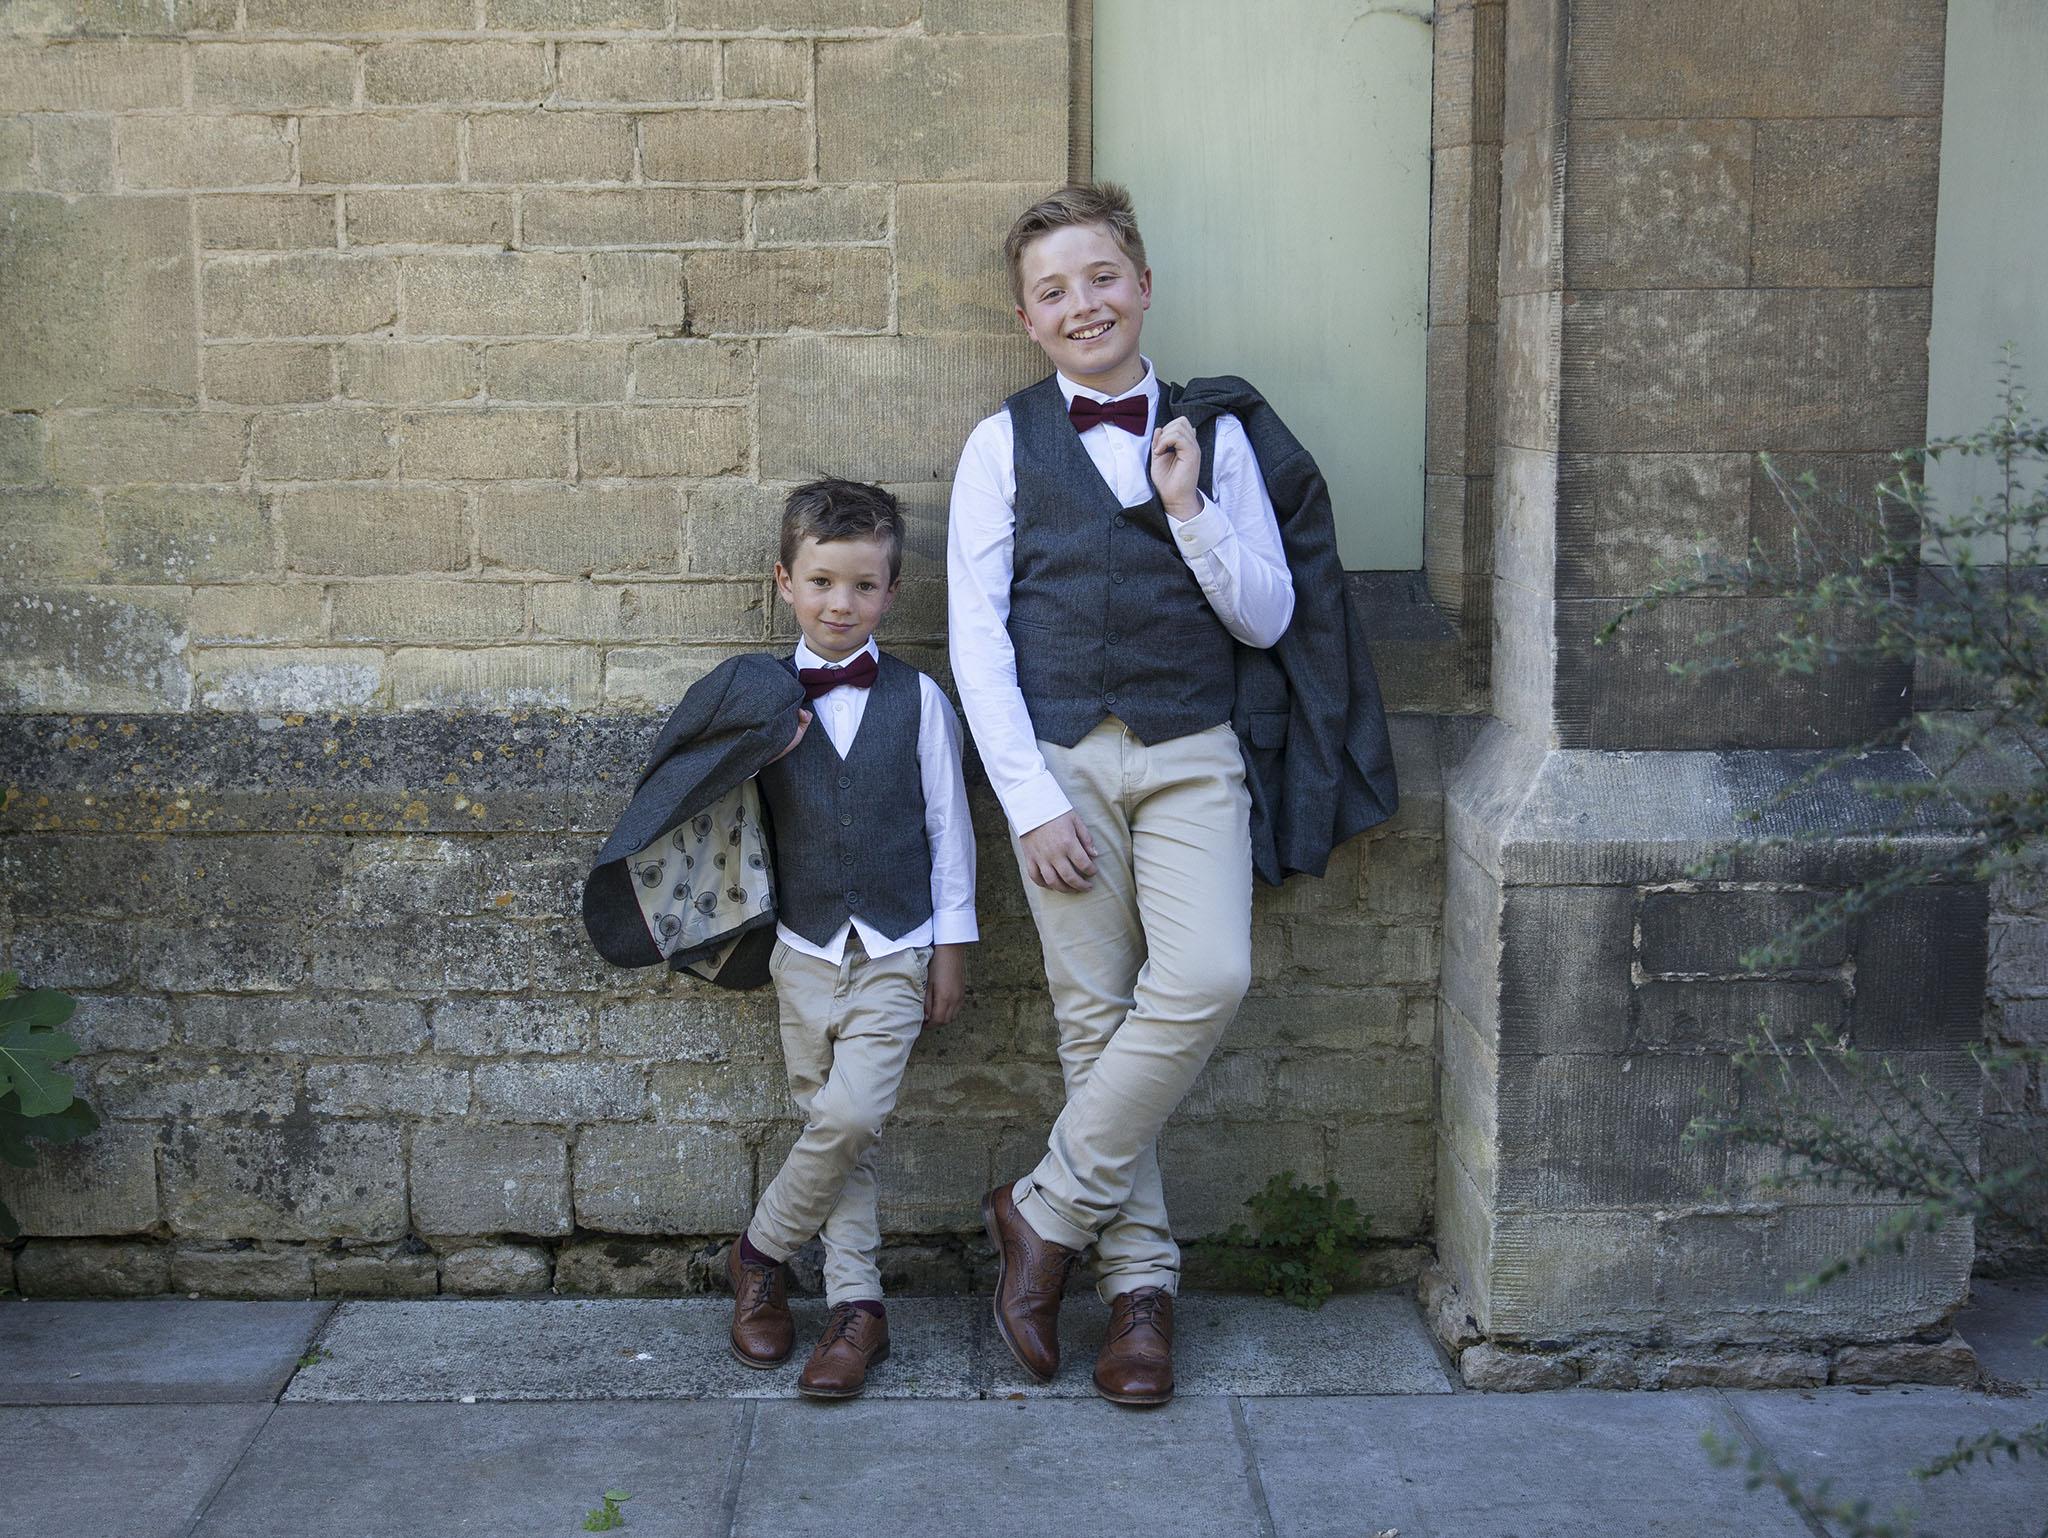 elizabethgphotography_kingslangley_hertfordshire_fineart_wedding_photography_lincolnshire_anna_simon_23.jpg